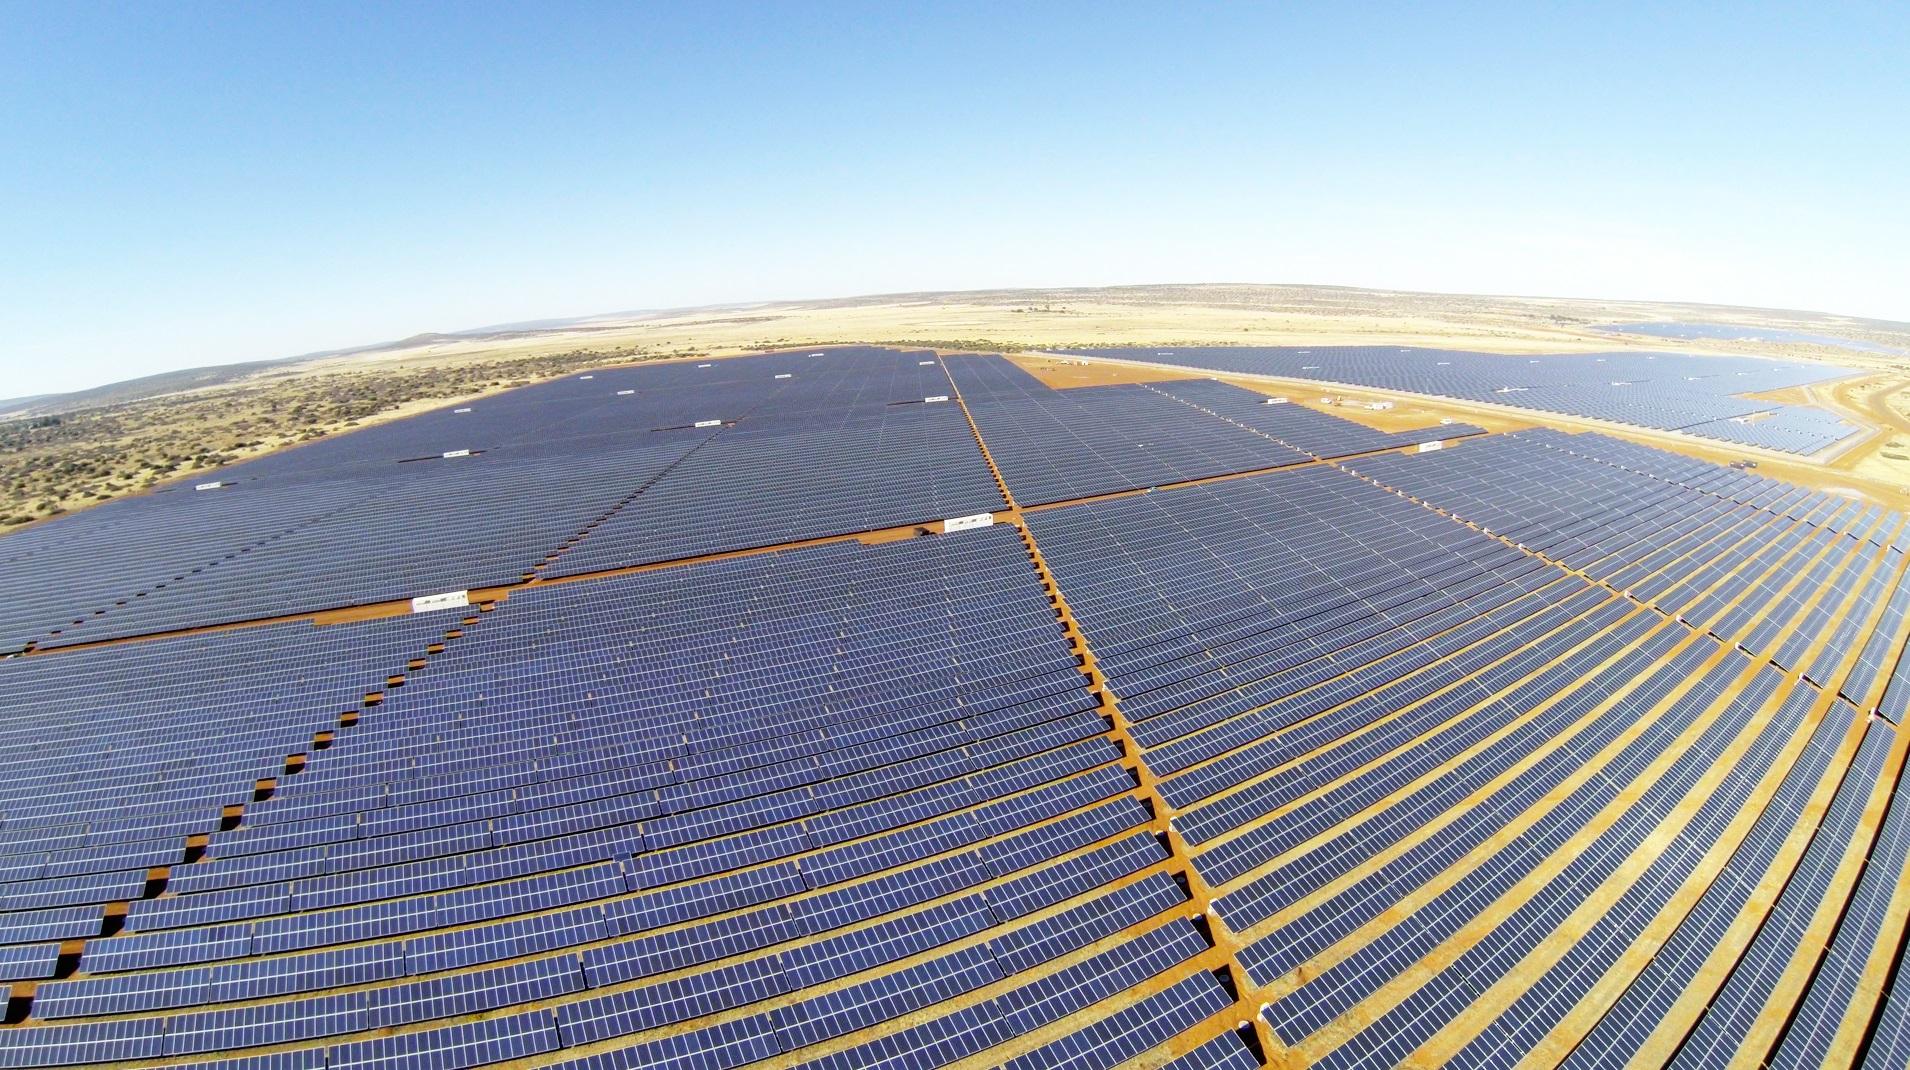 Esta futura planta solar dará energía a un millón de hogares